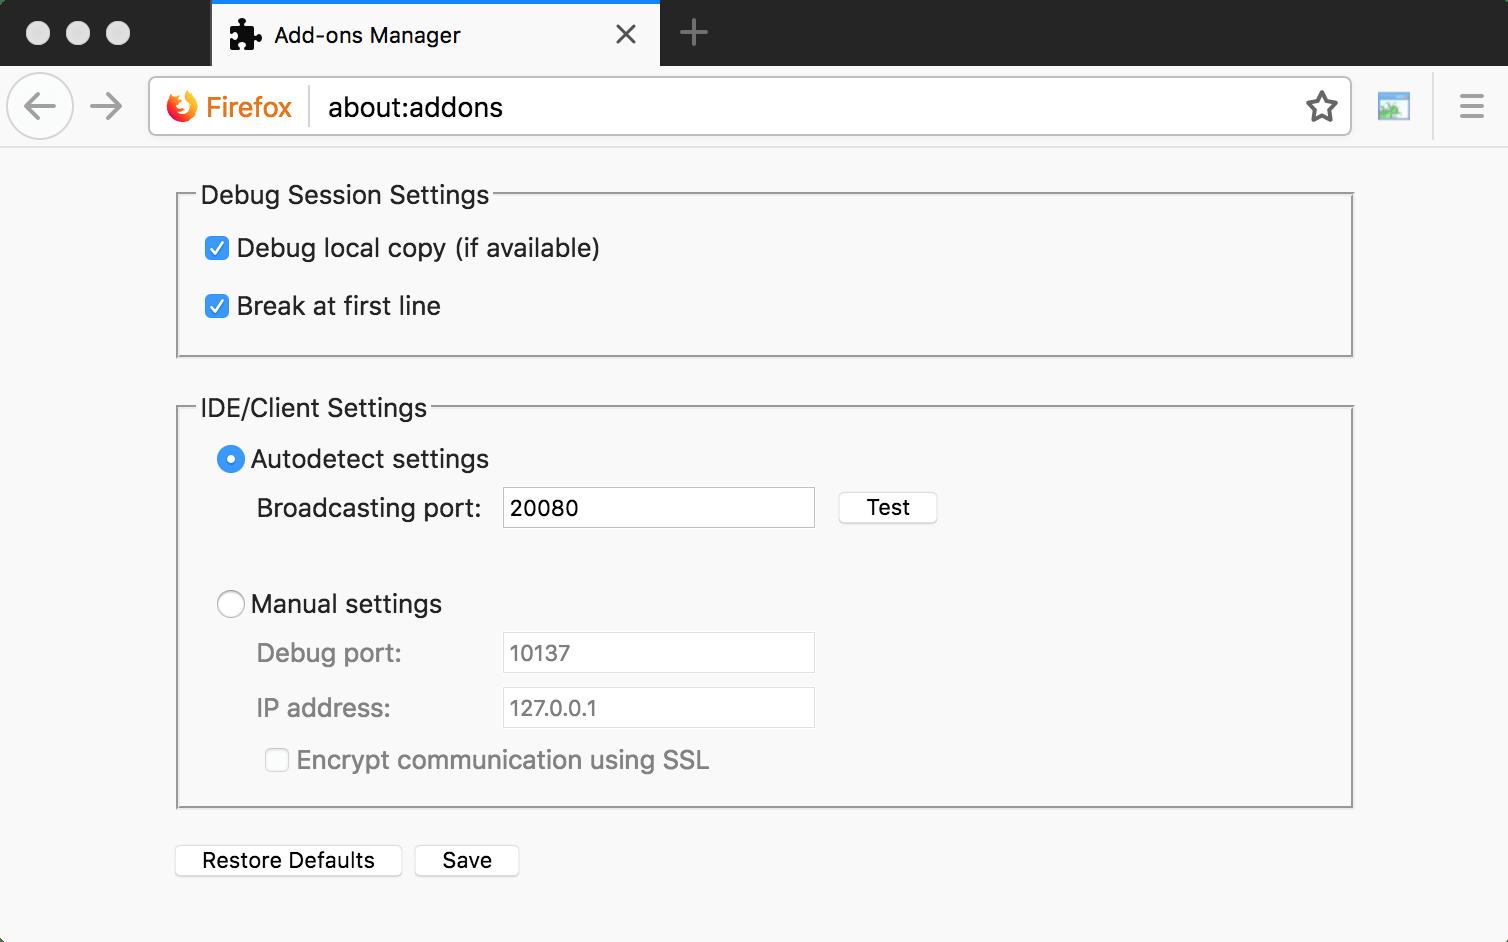 Zend debugger extension in Firefox